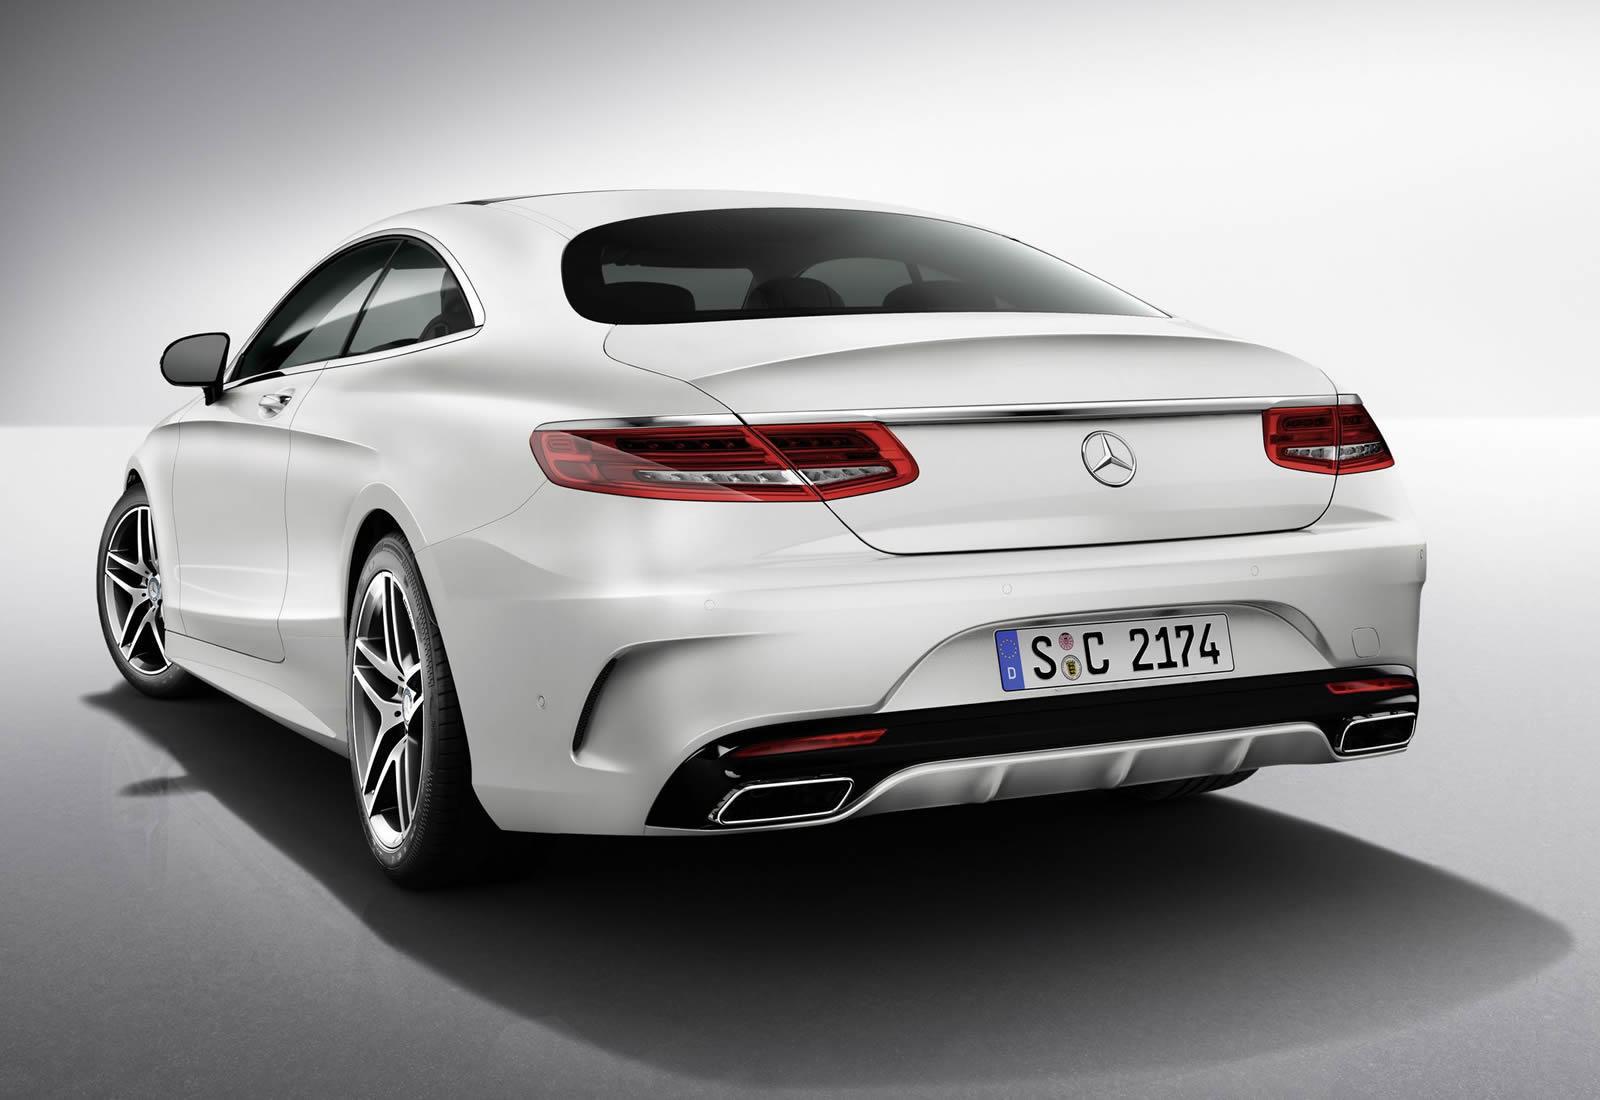 Mercedes Amg C S Coupe Price